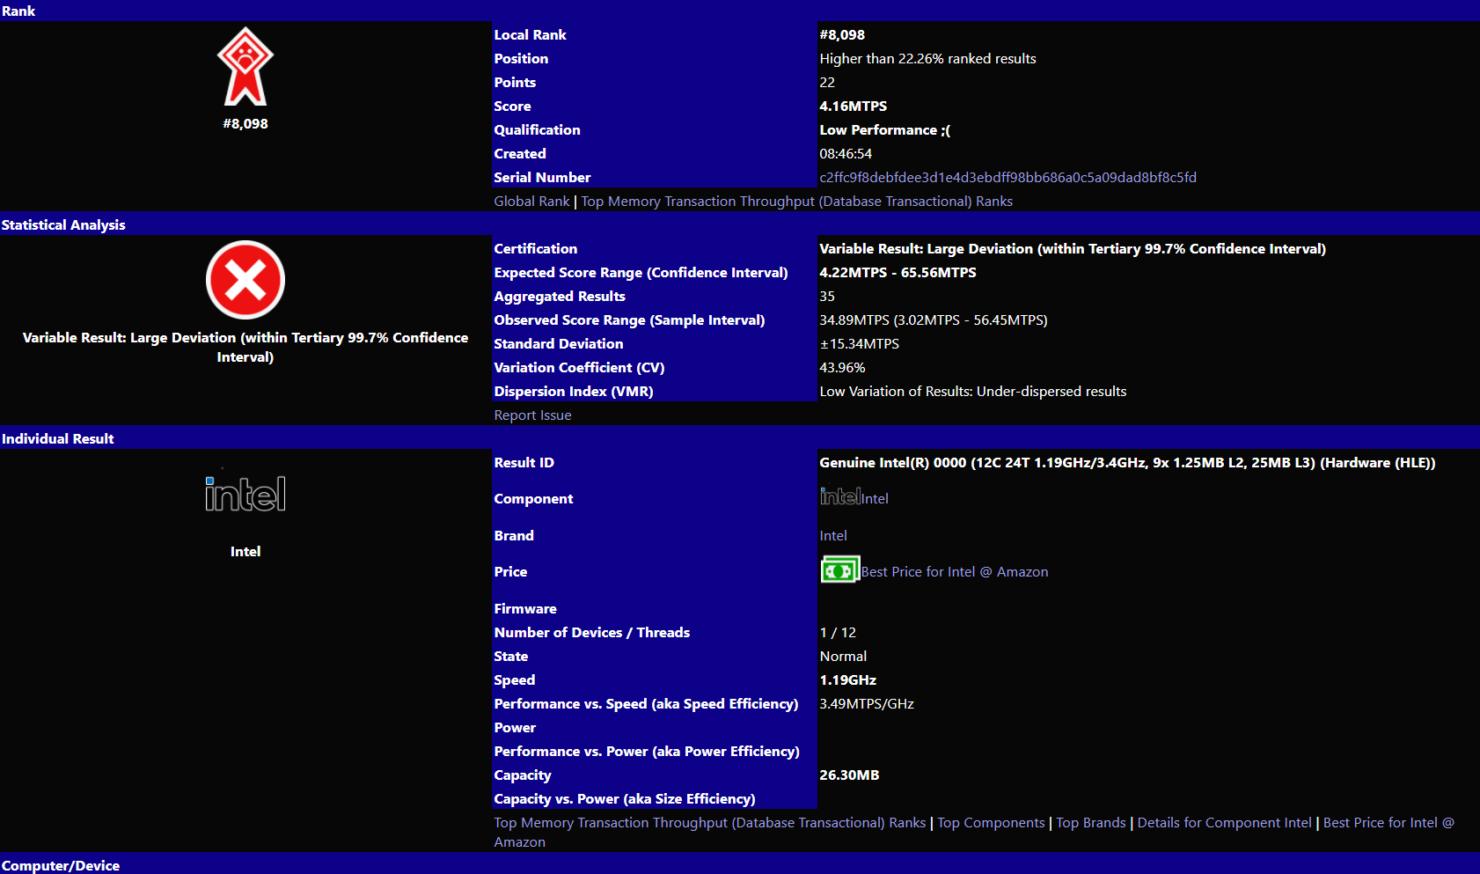 intel-core-i7-12700k-alder-lake-desktop-cpu-sample-_2